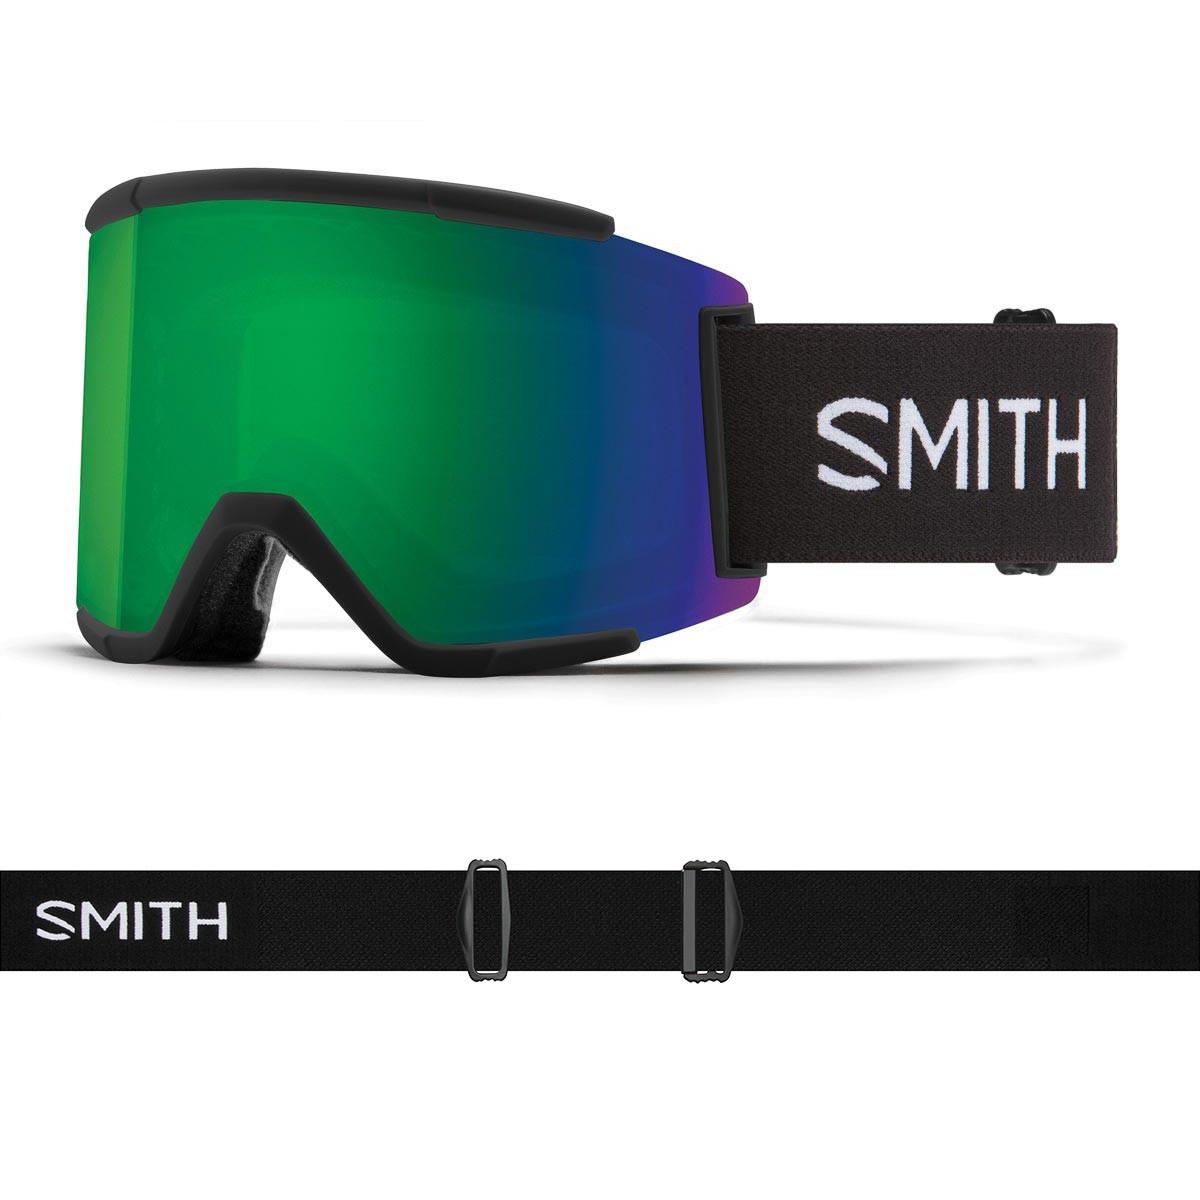 SMITH SQUAD XL black | S2 CHROMAPOP Everyday Green Mirror - Изображение - AQUAMATRIX